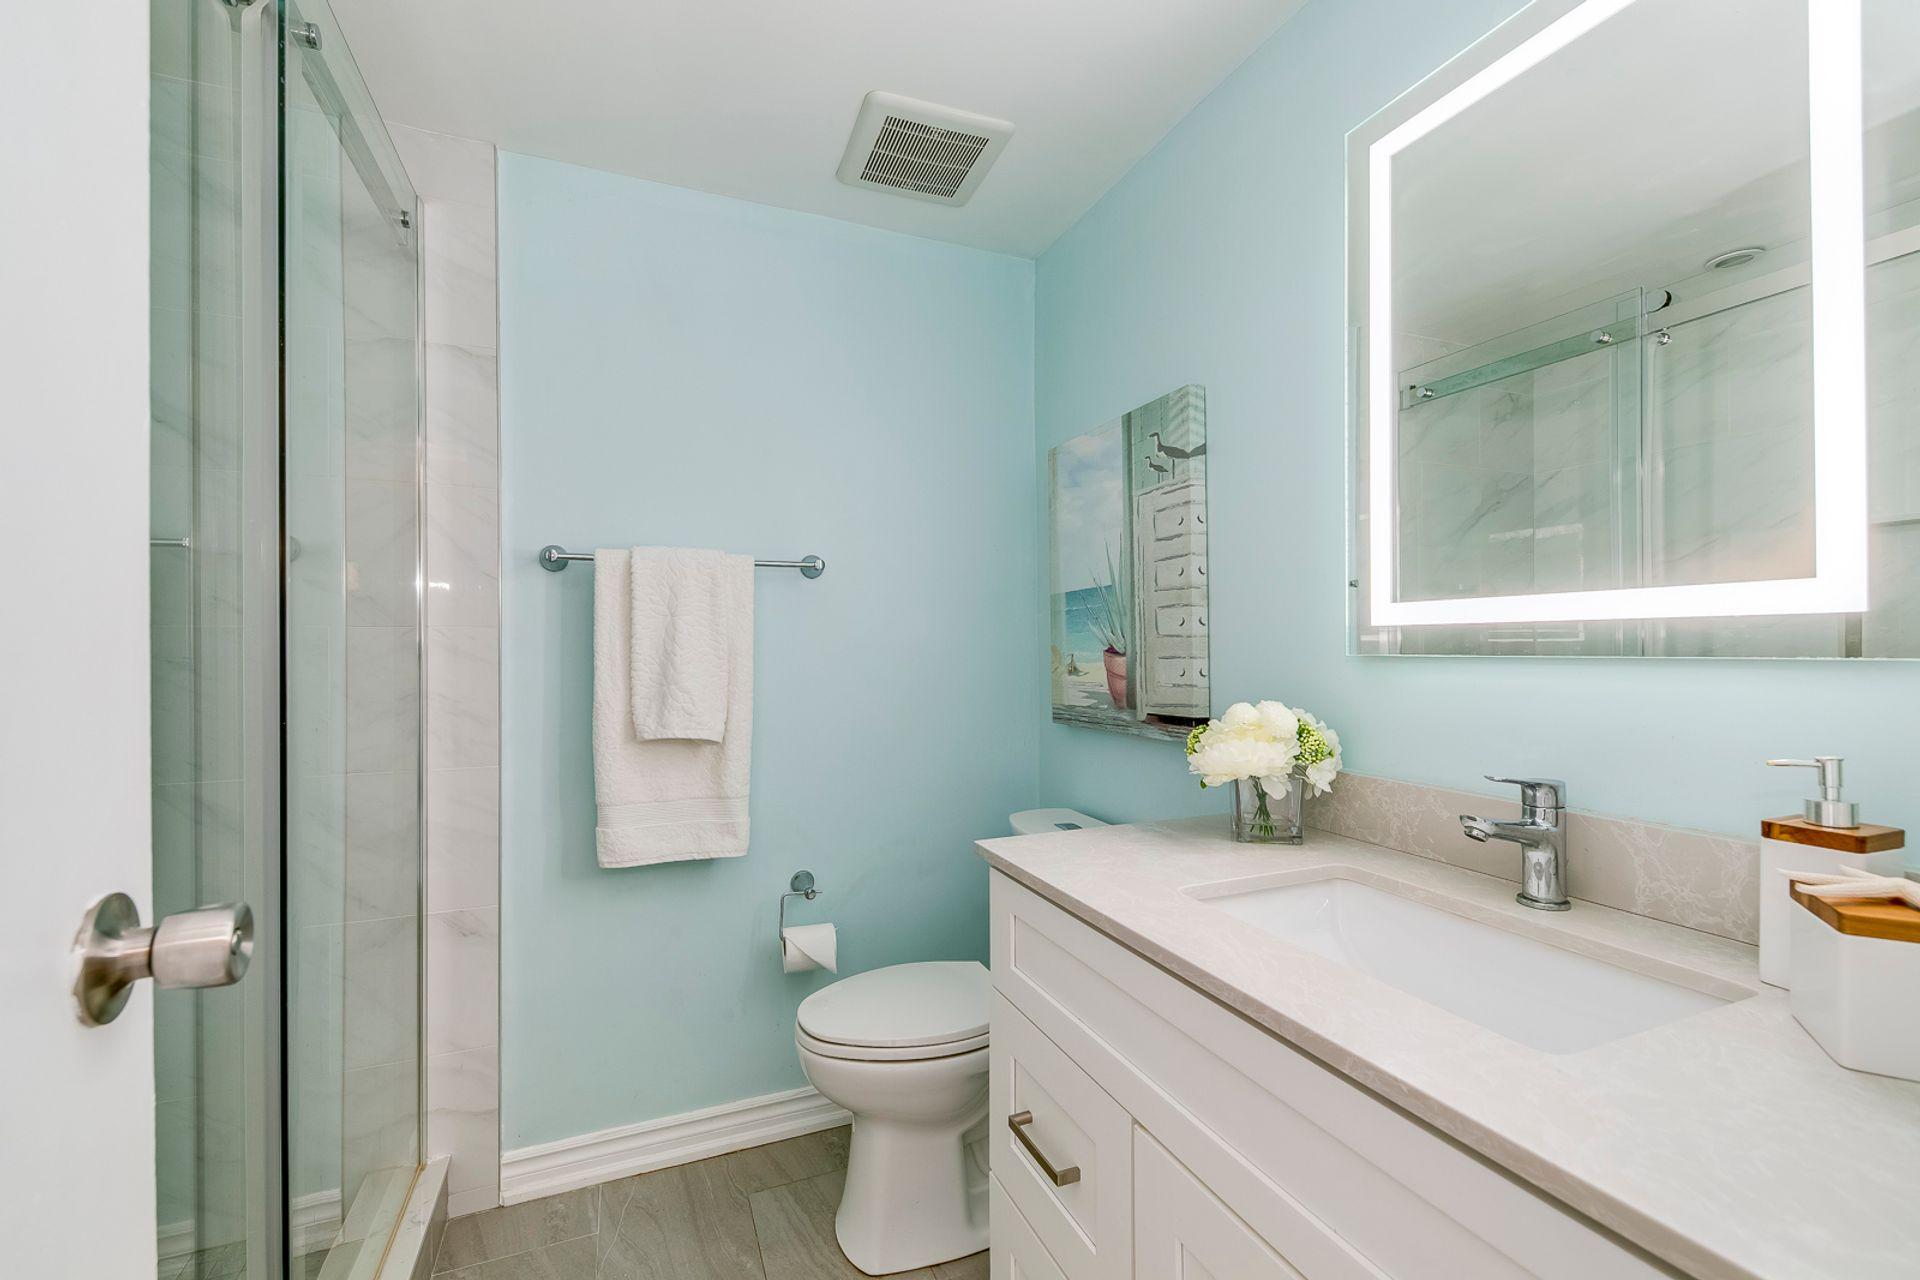 Main Bathroom - 6278 Lavery Crt, Mississauga - Elite3 & Team at 6278 Lavery Court, Meadowvale, Mississauga